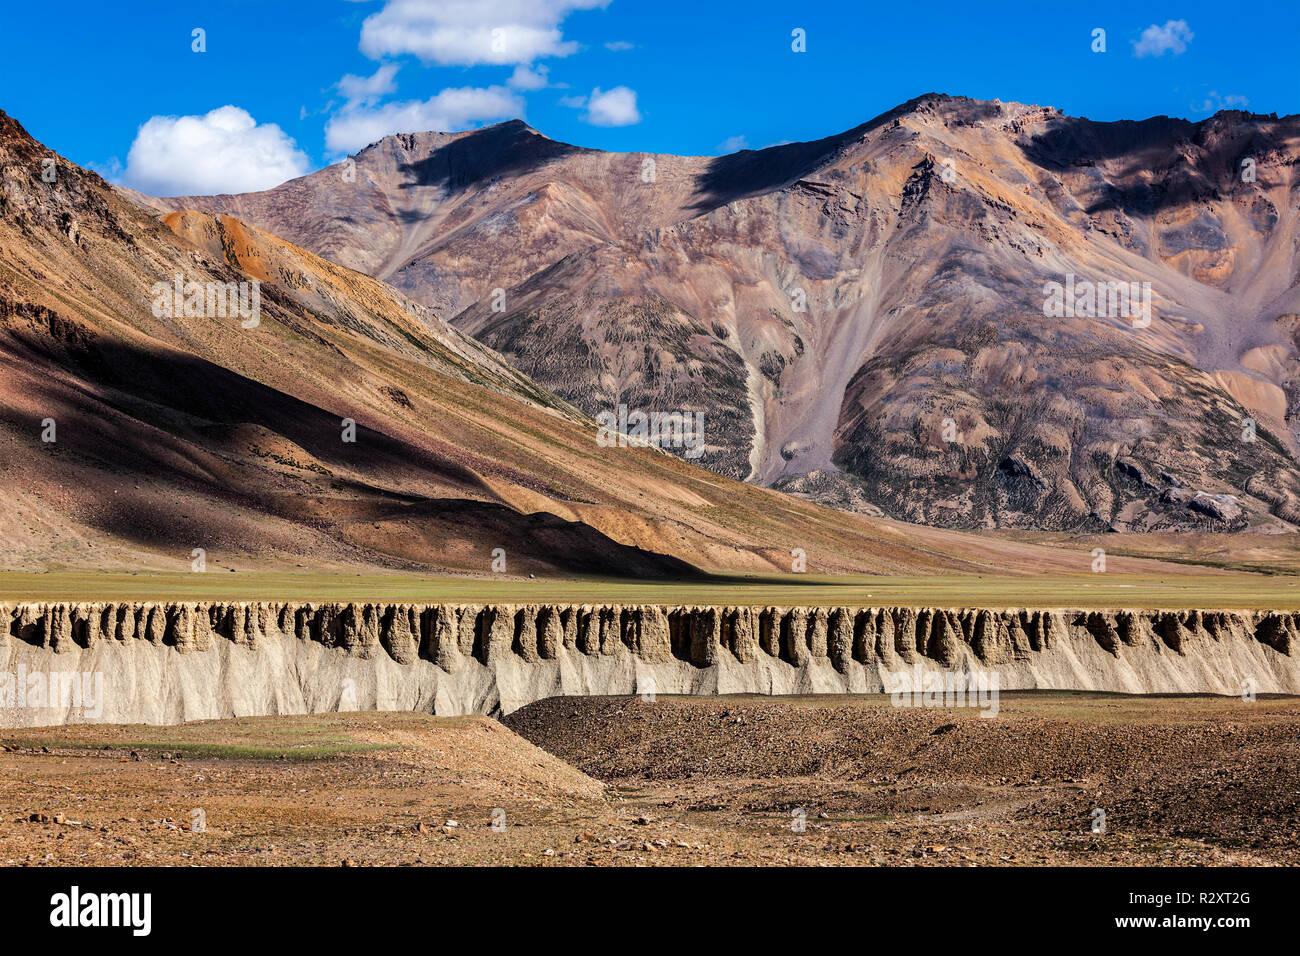 Landscape in Himalayas. Himchal Pradesh, India - Stock Image